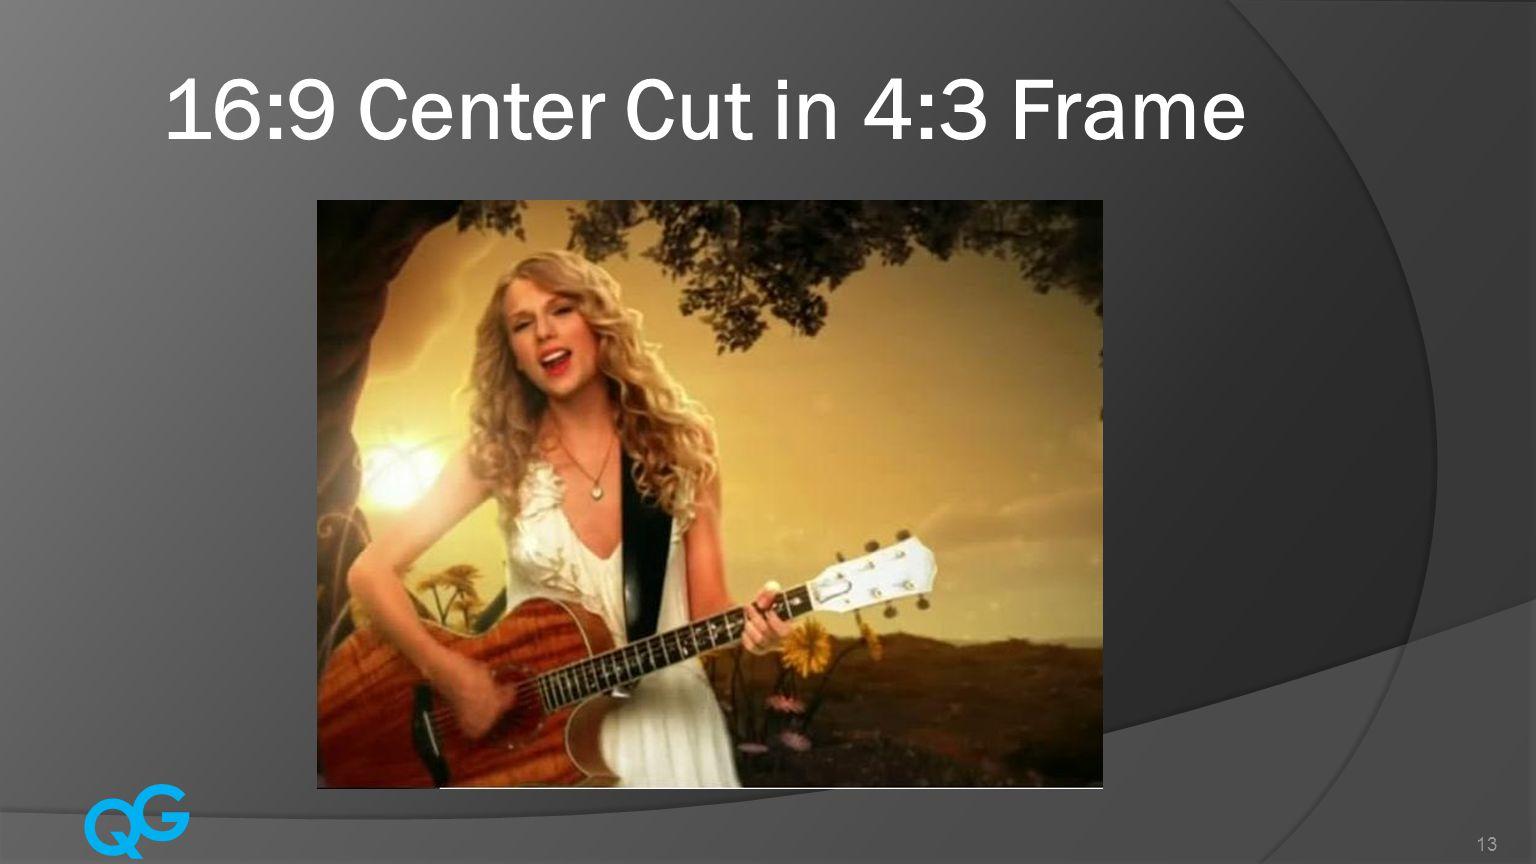 Q G 13 16:9 Center Cut in 4:3 Frame